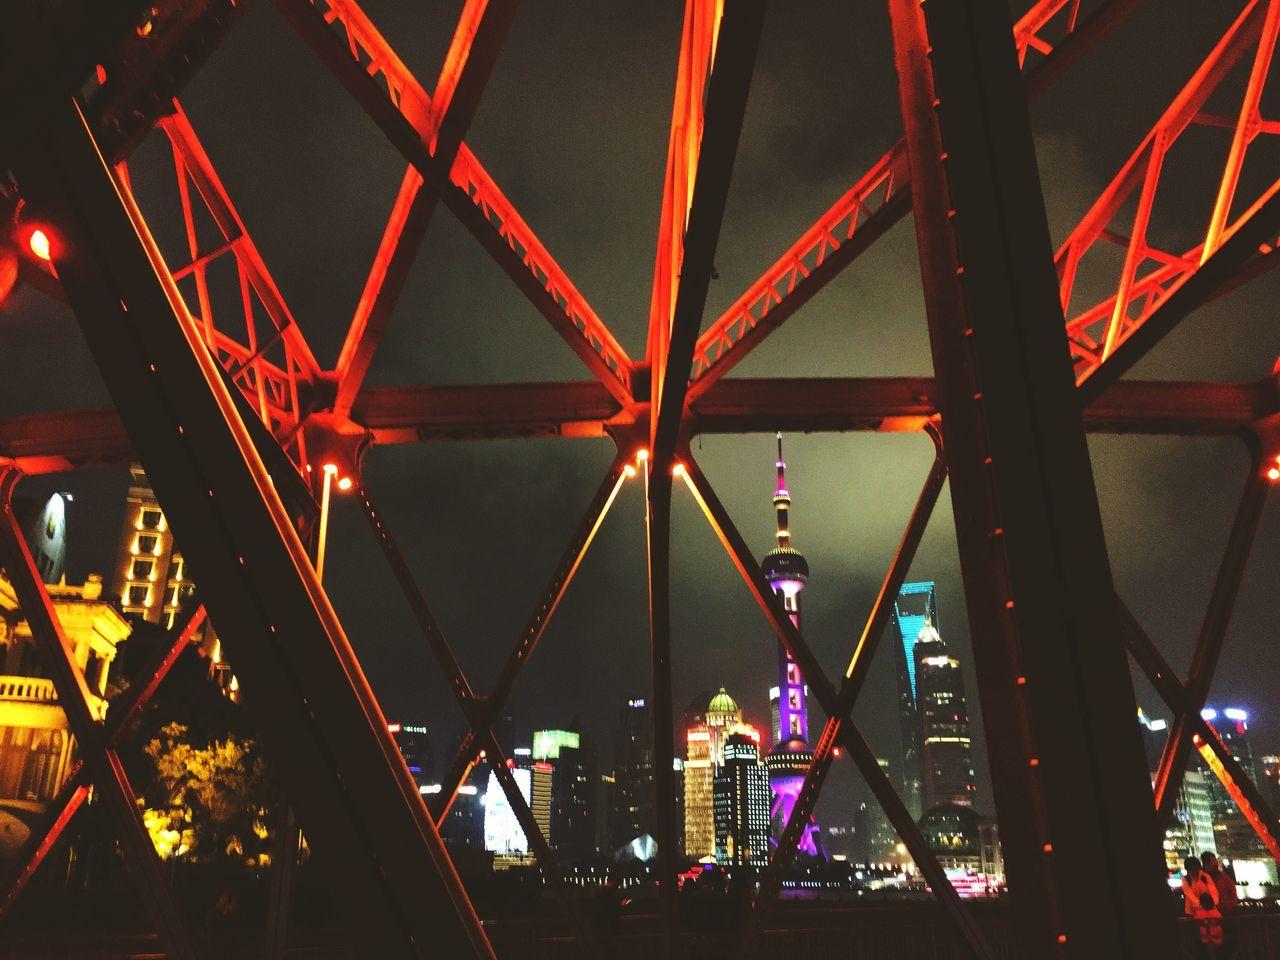 Architecture Minimalist Architecture Lifestyles Travel Bridge - Man Made Structure Travel Destinations Night